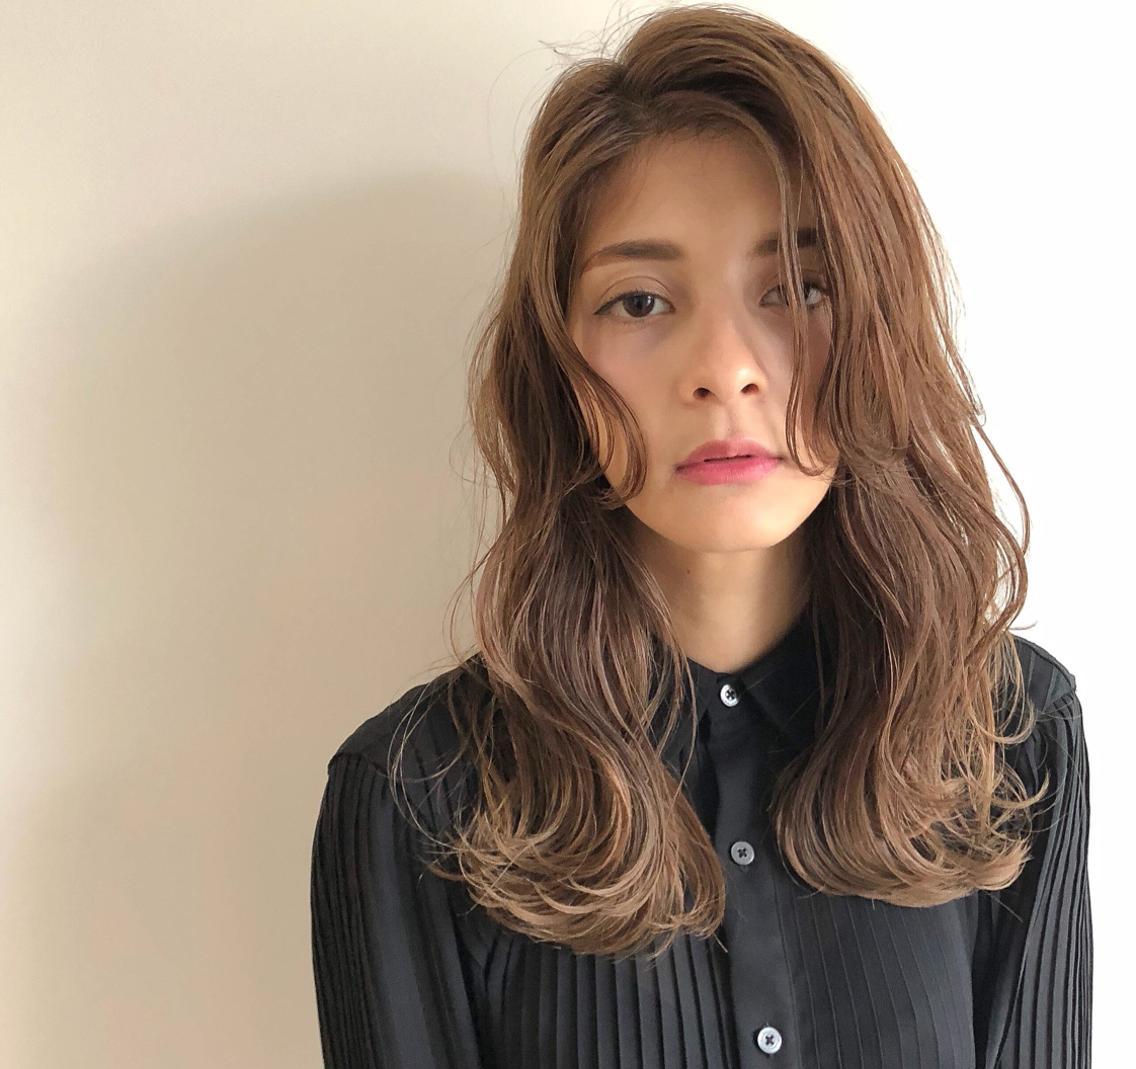 ⭕️東京、名古屋で6店舗展開中⭕️エリアNo. 1の透明感カラーを提案しています✨